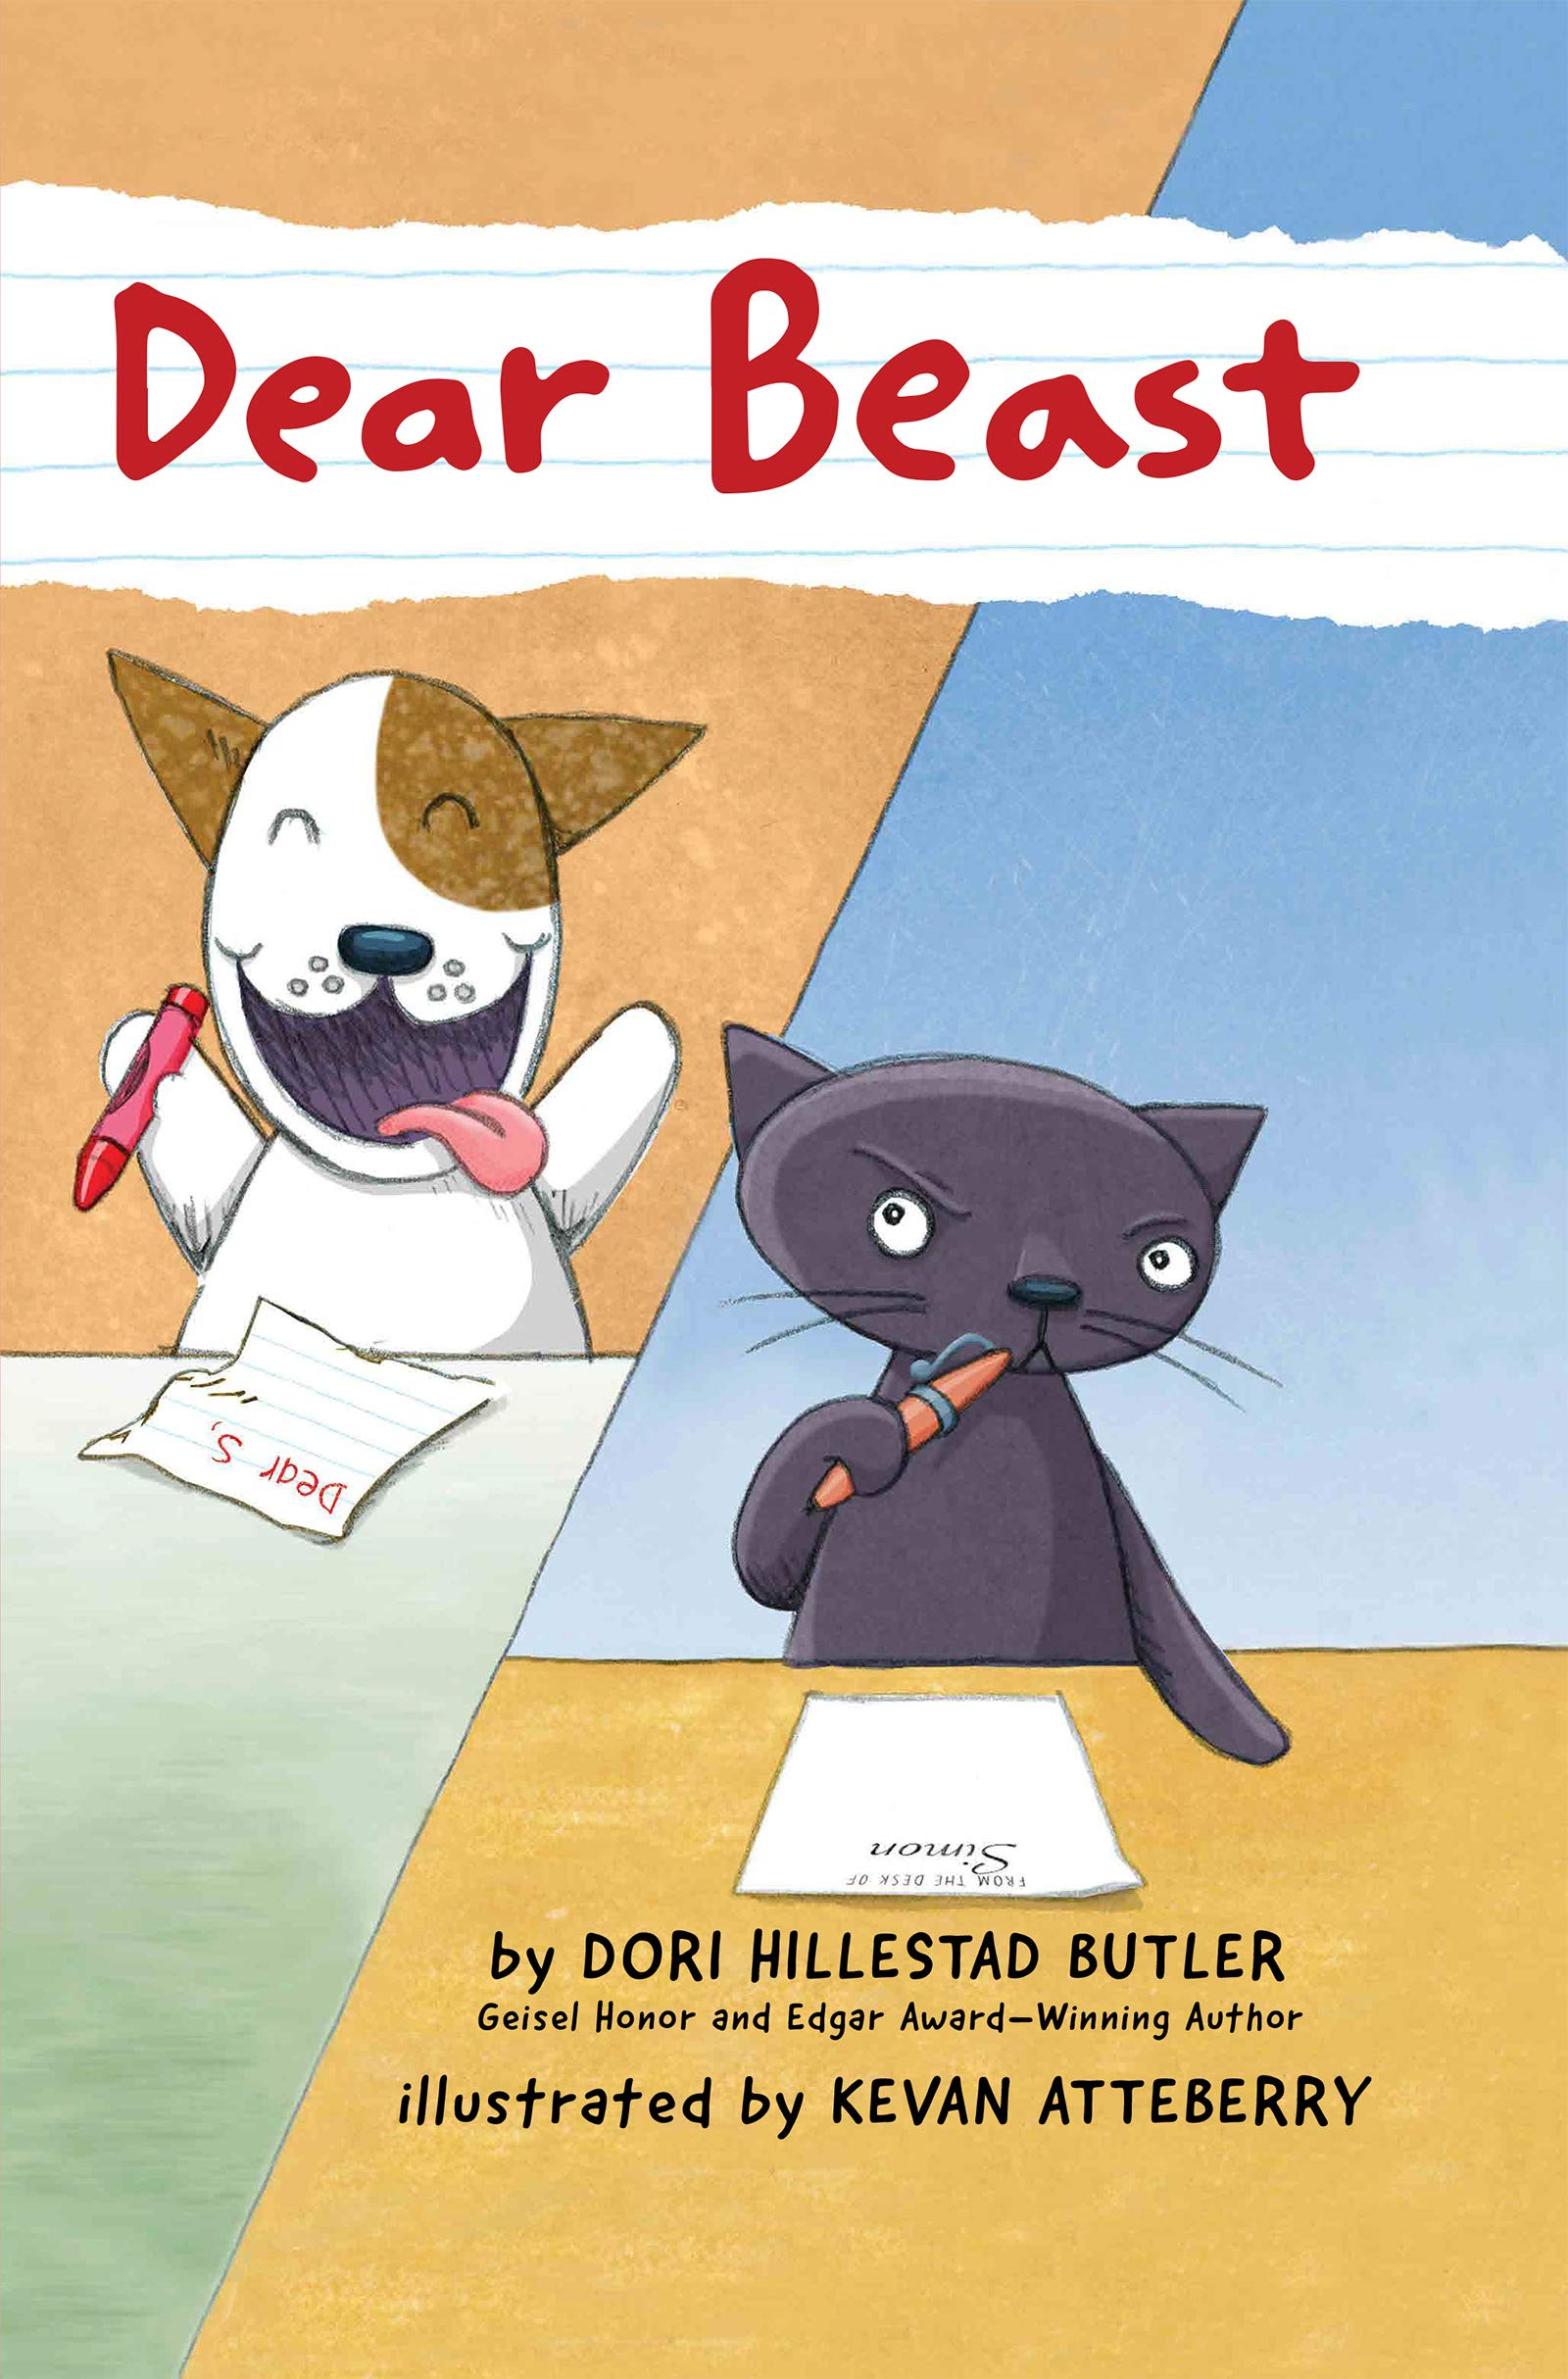 Amazon.com: Dear Beast (9780823444922): Butler, Dori Hillestad, Atteberry, Kevan: Books